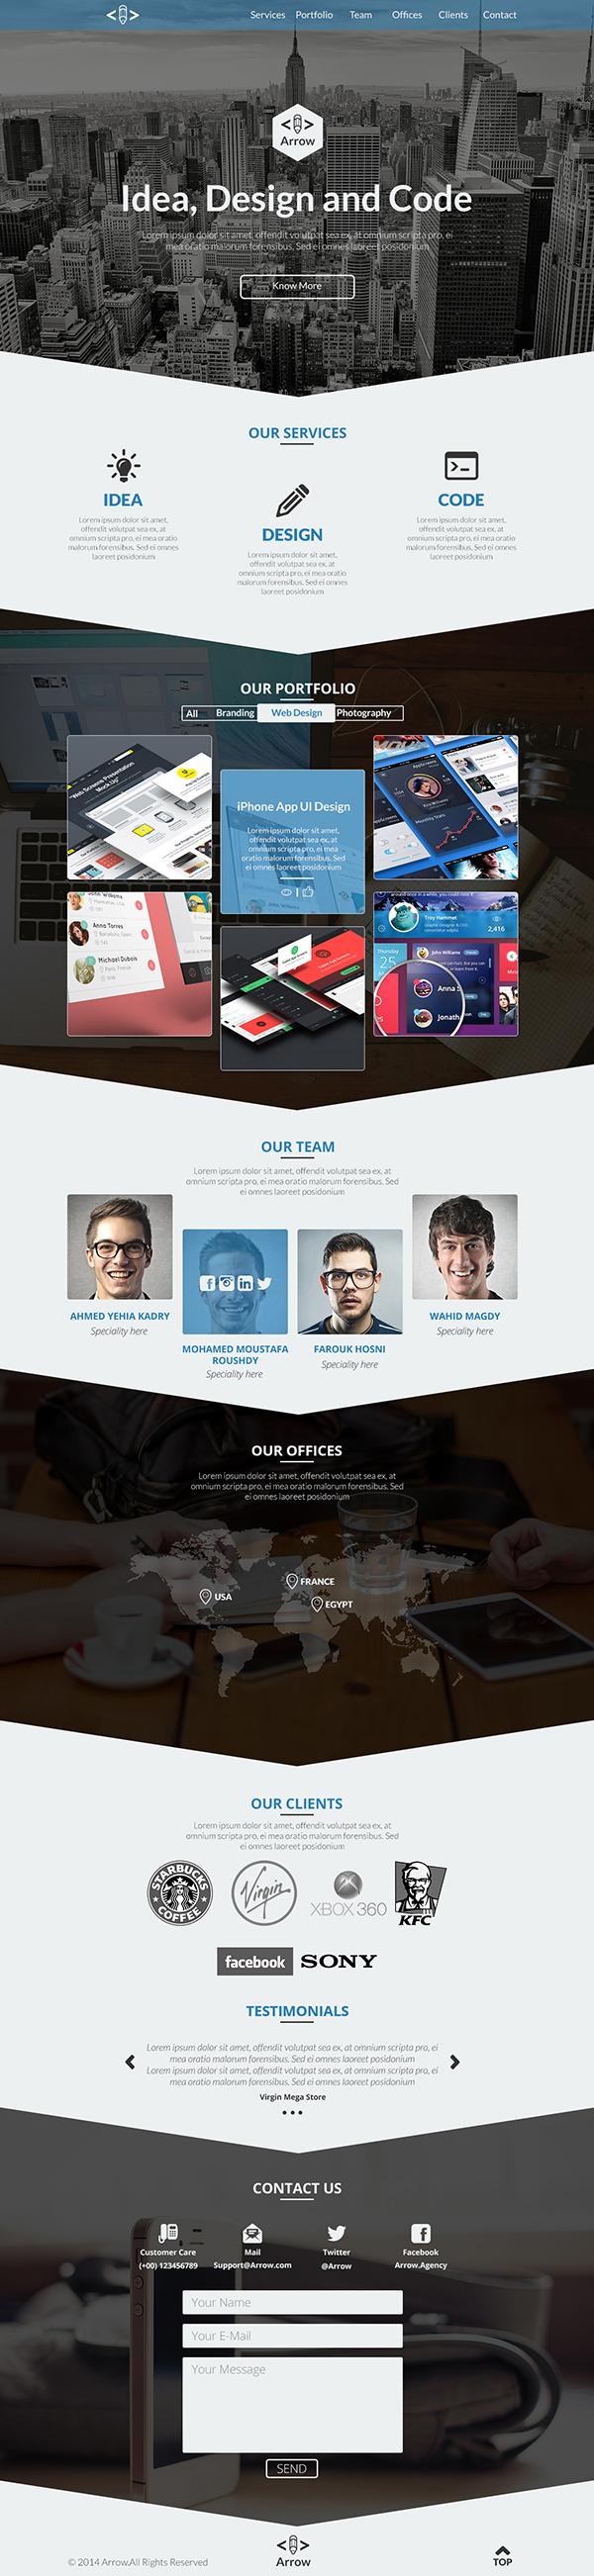 Arrow - Free One Page Business Portfolio PSD Template